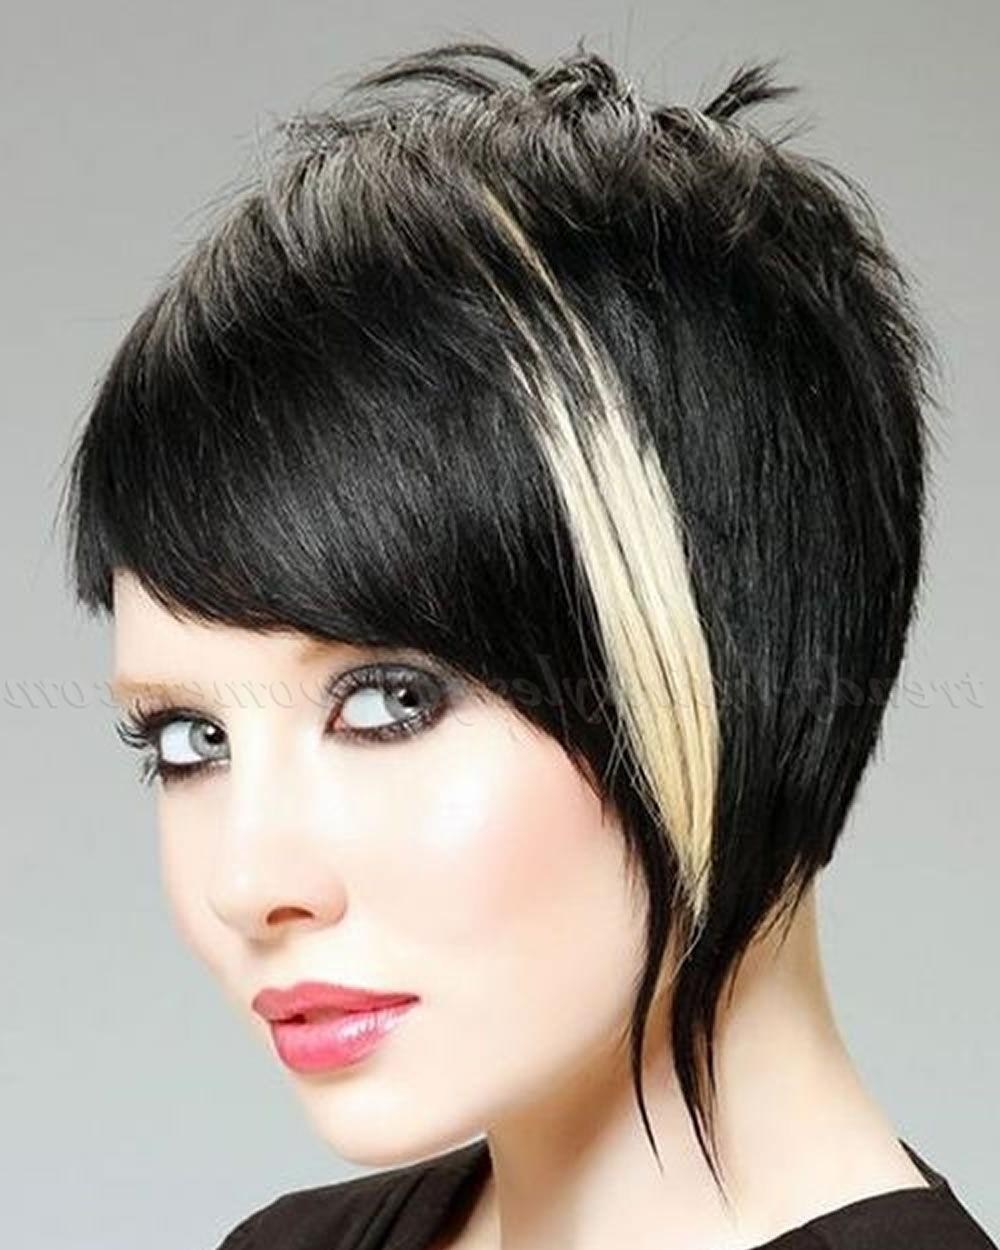 Asymmetric Short Hair 2019 – 33 Haute Short Hairstyles & Haircuts Throughout Asymmetric Short Haircuts (Gallery 5 of 25)